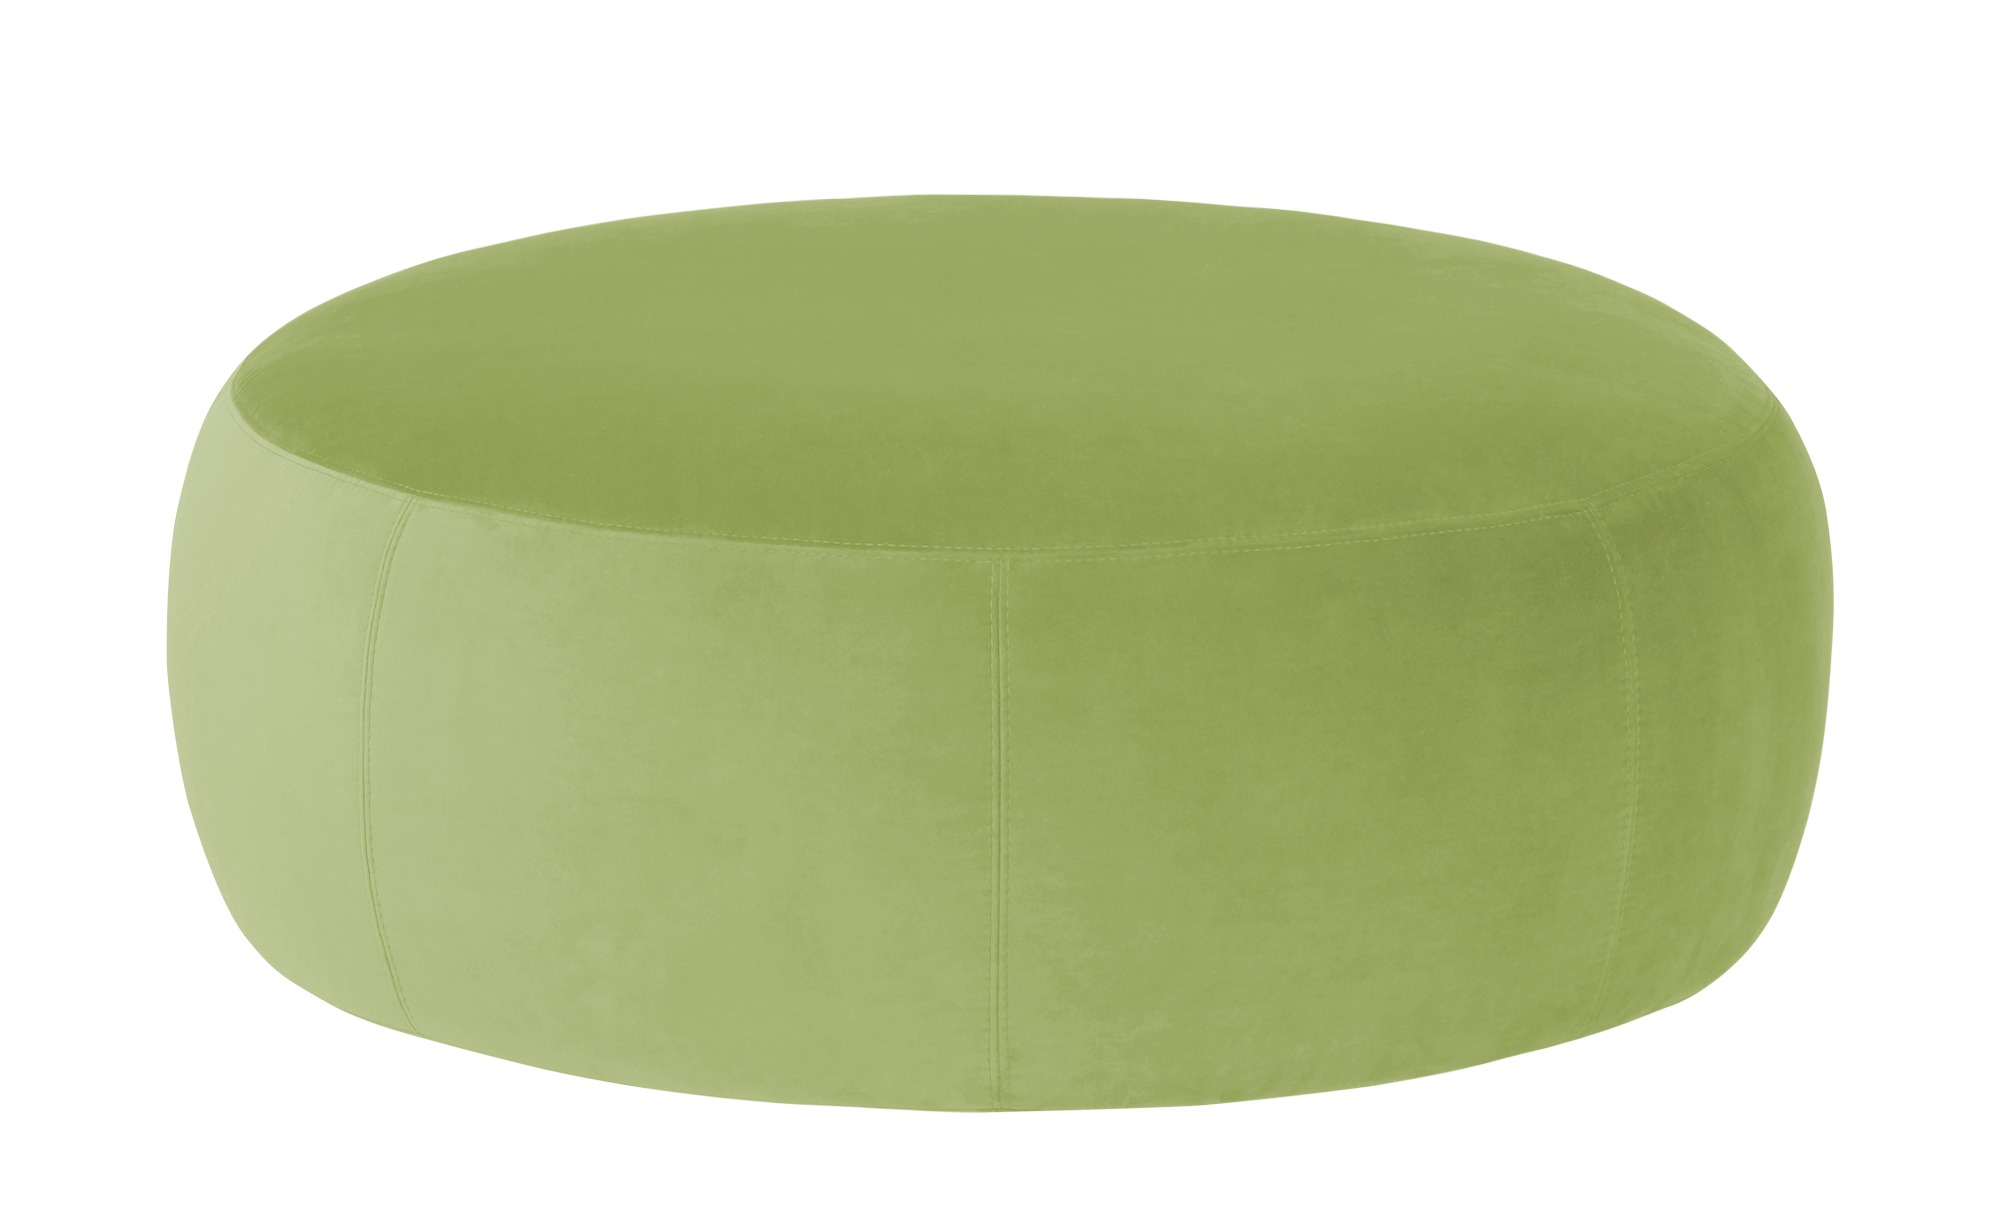 #pop Samt Hocker  Amadi ¦ grün ¦ Maße (cm): H: 40 Ø: 105 Polstermöbel > Hocker – Höffner#